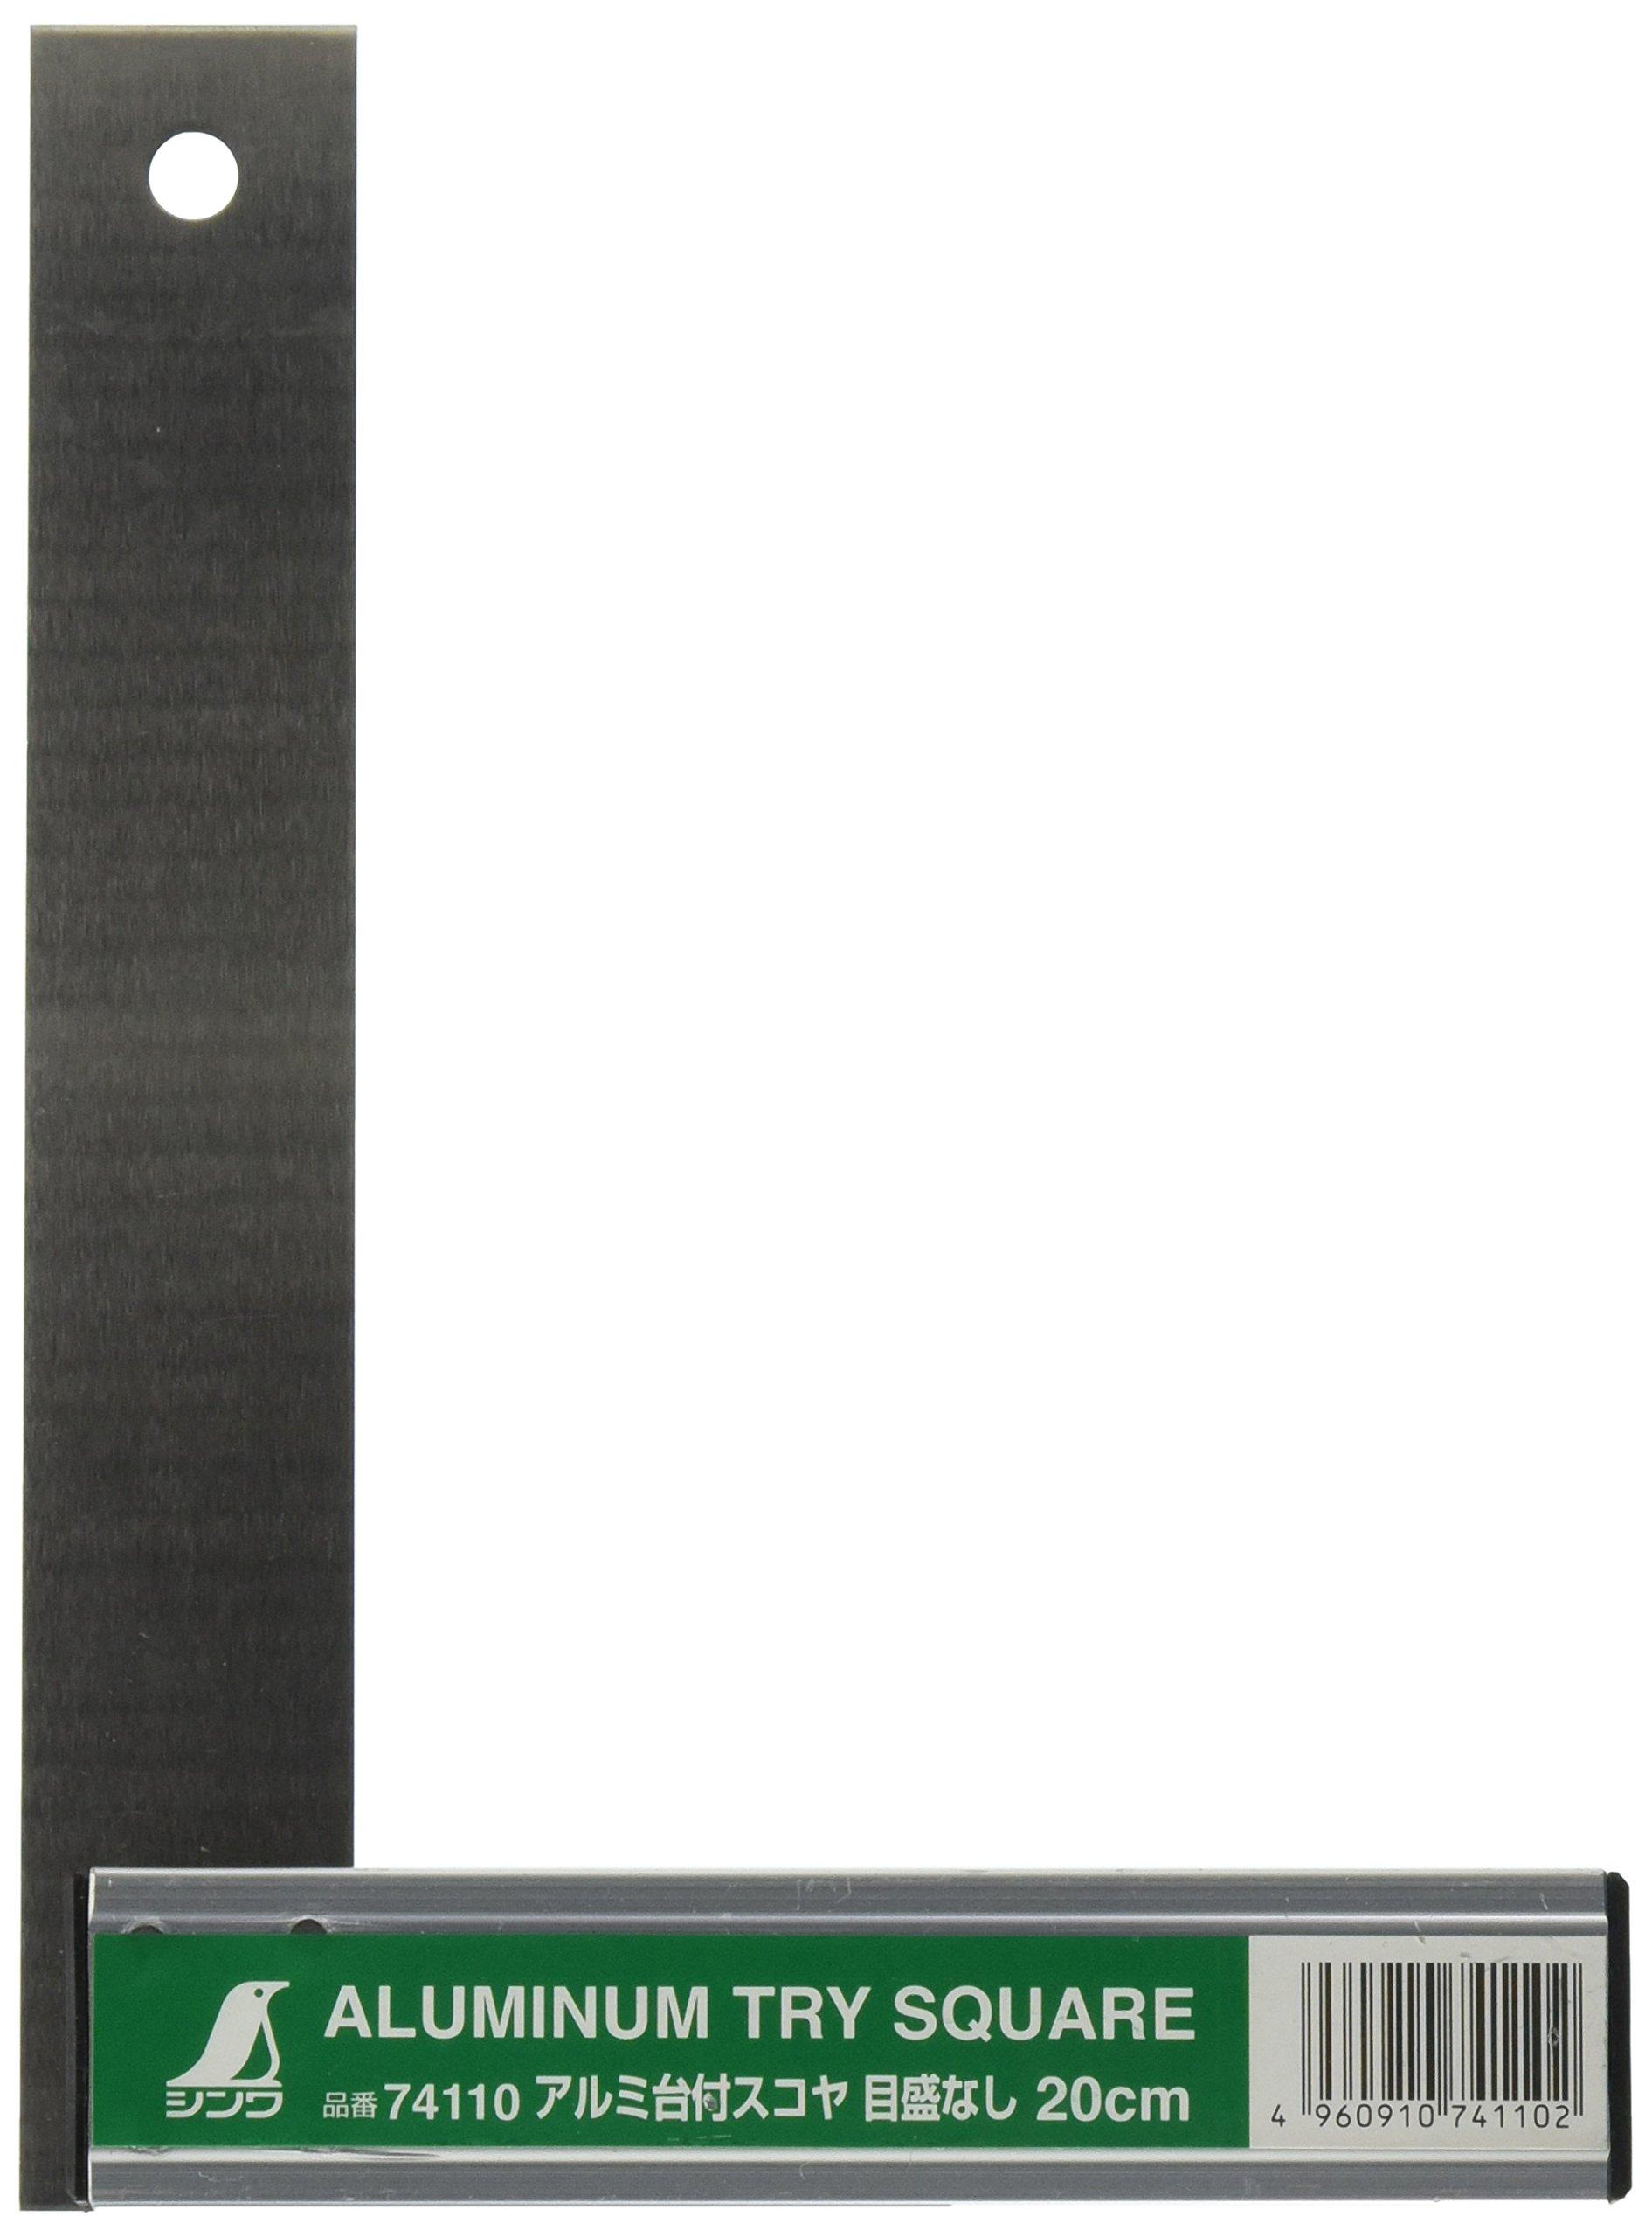 SINWA Shinwa measurement Aluminum base attachment Scoy 20 cm scale None 74110 4960910741102